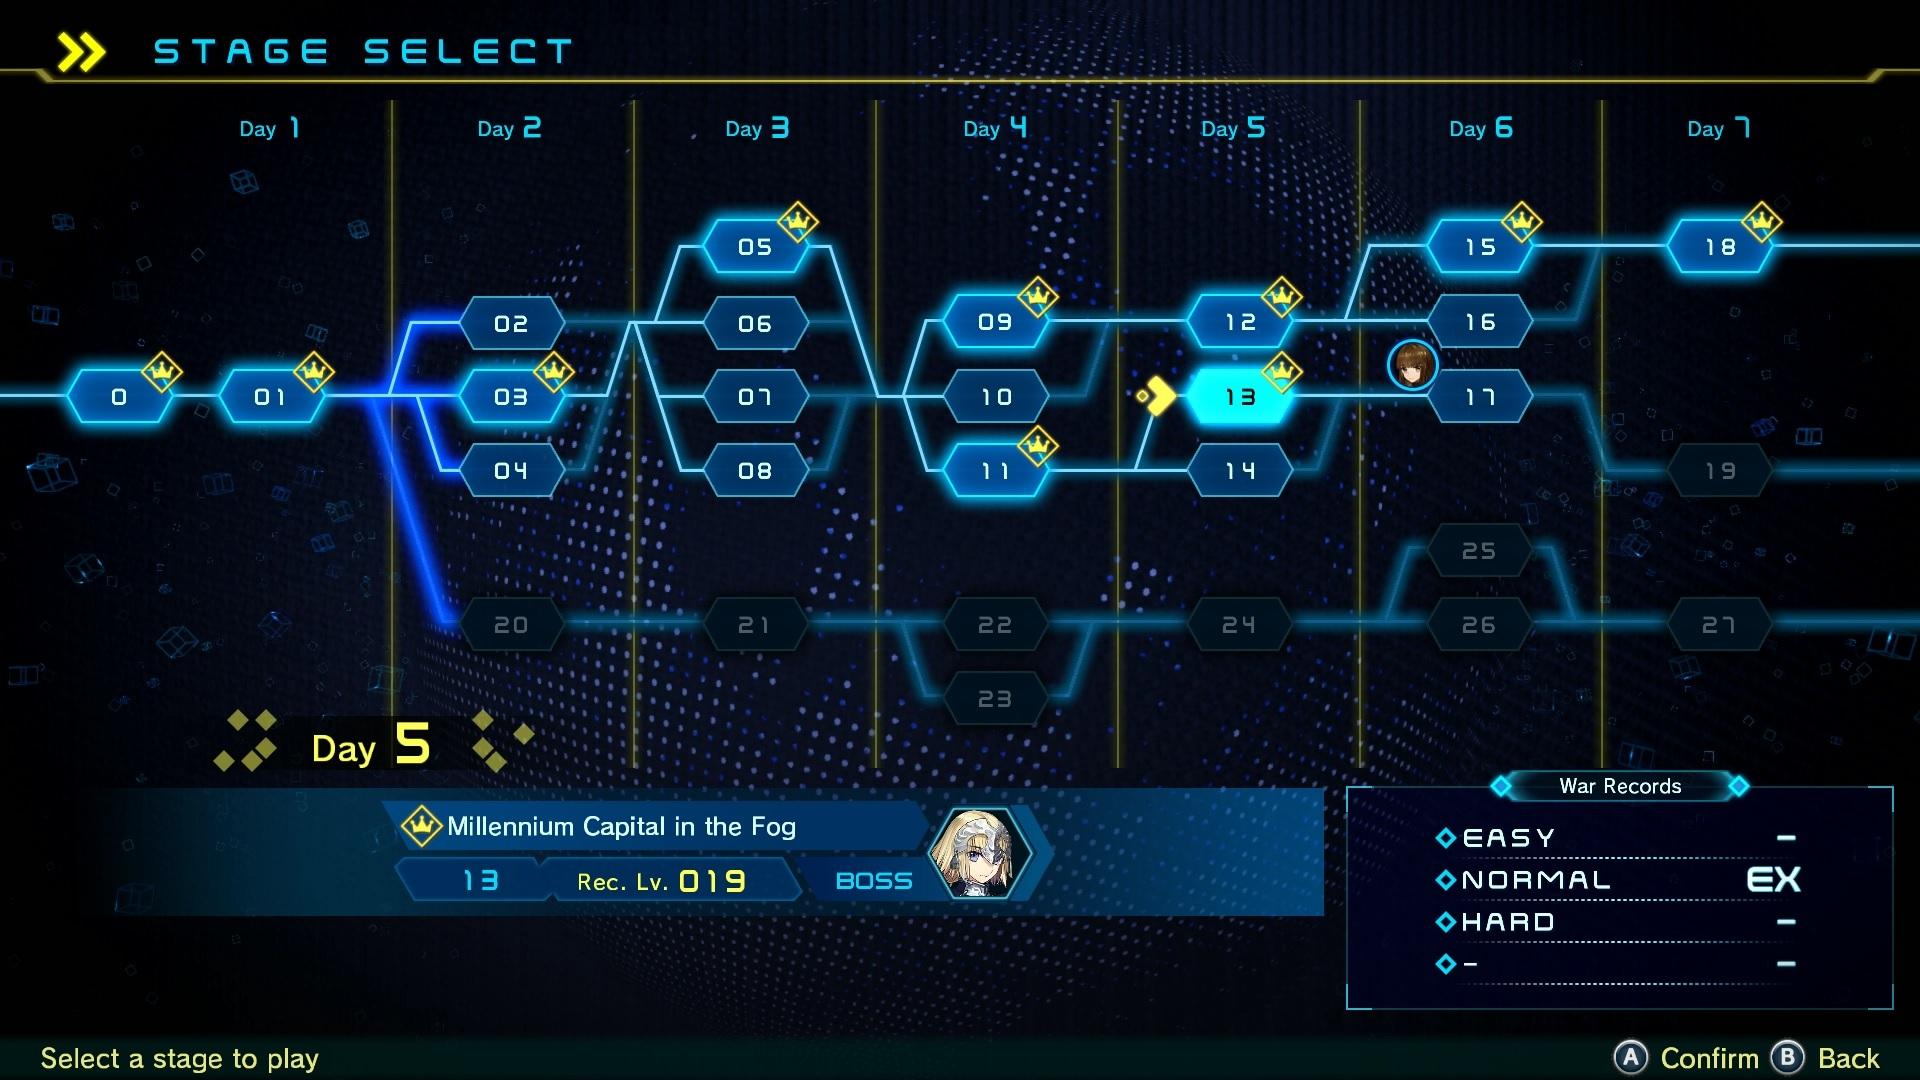 Fate EXTELLA_LINK - Timeline Chan 01.jpg